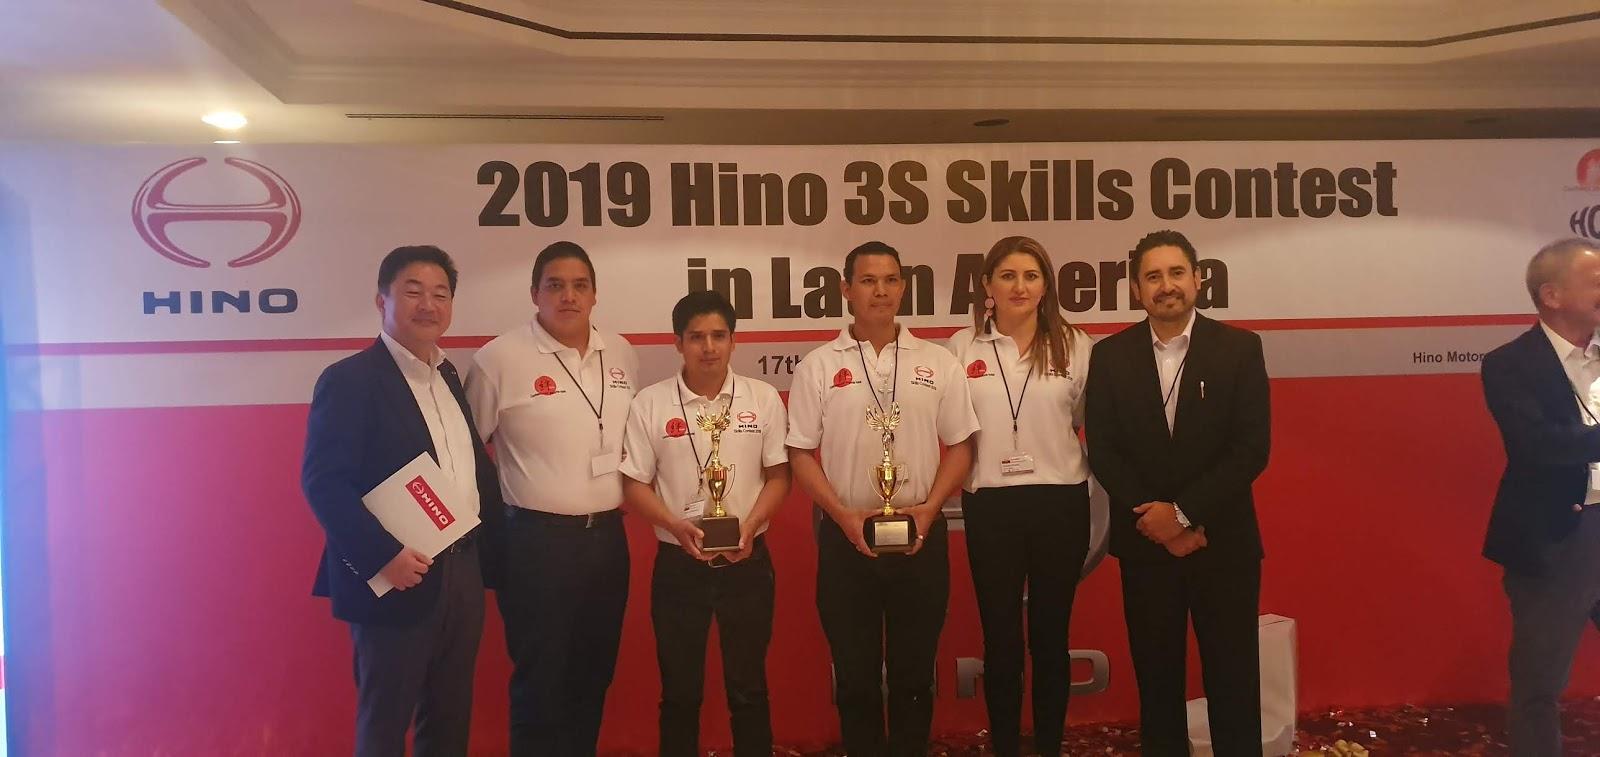 Teojama Comercial fue parte del Hino 3s Skill Contest 2020